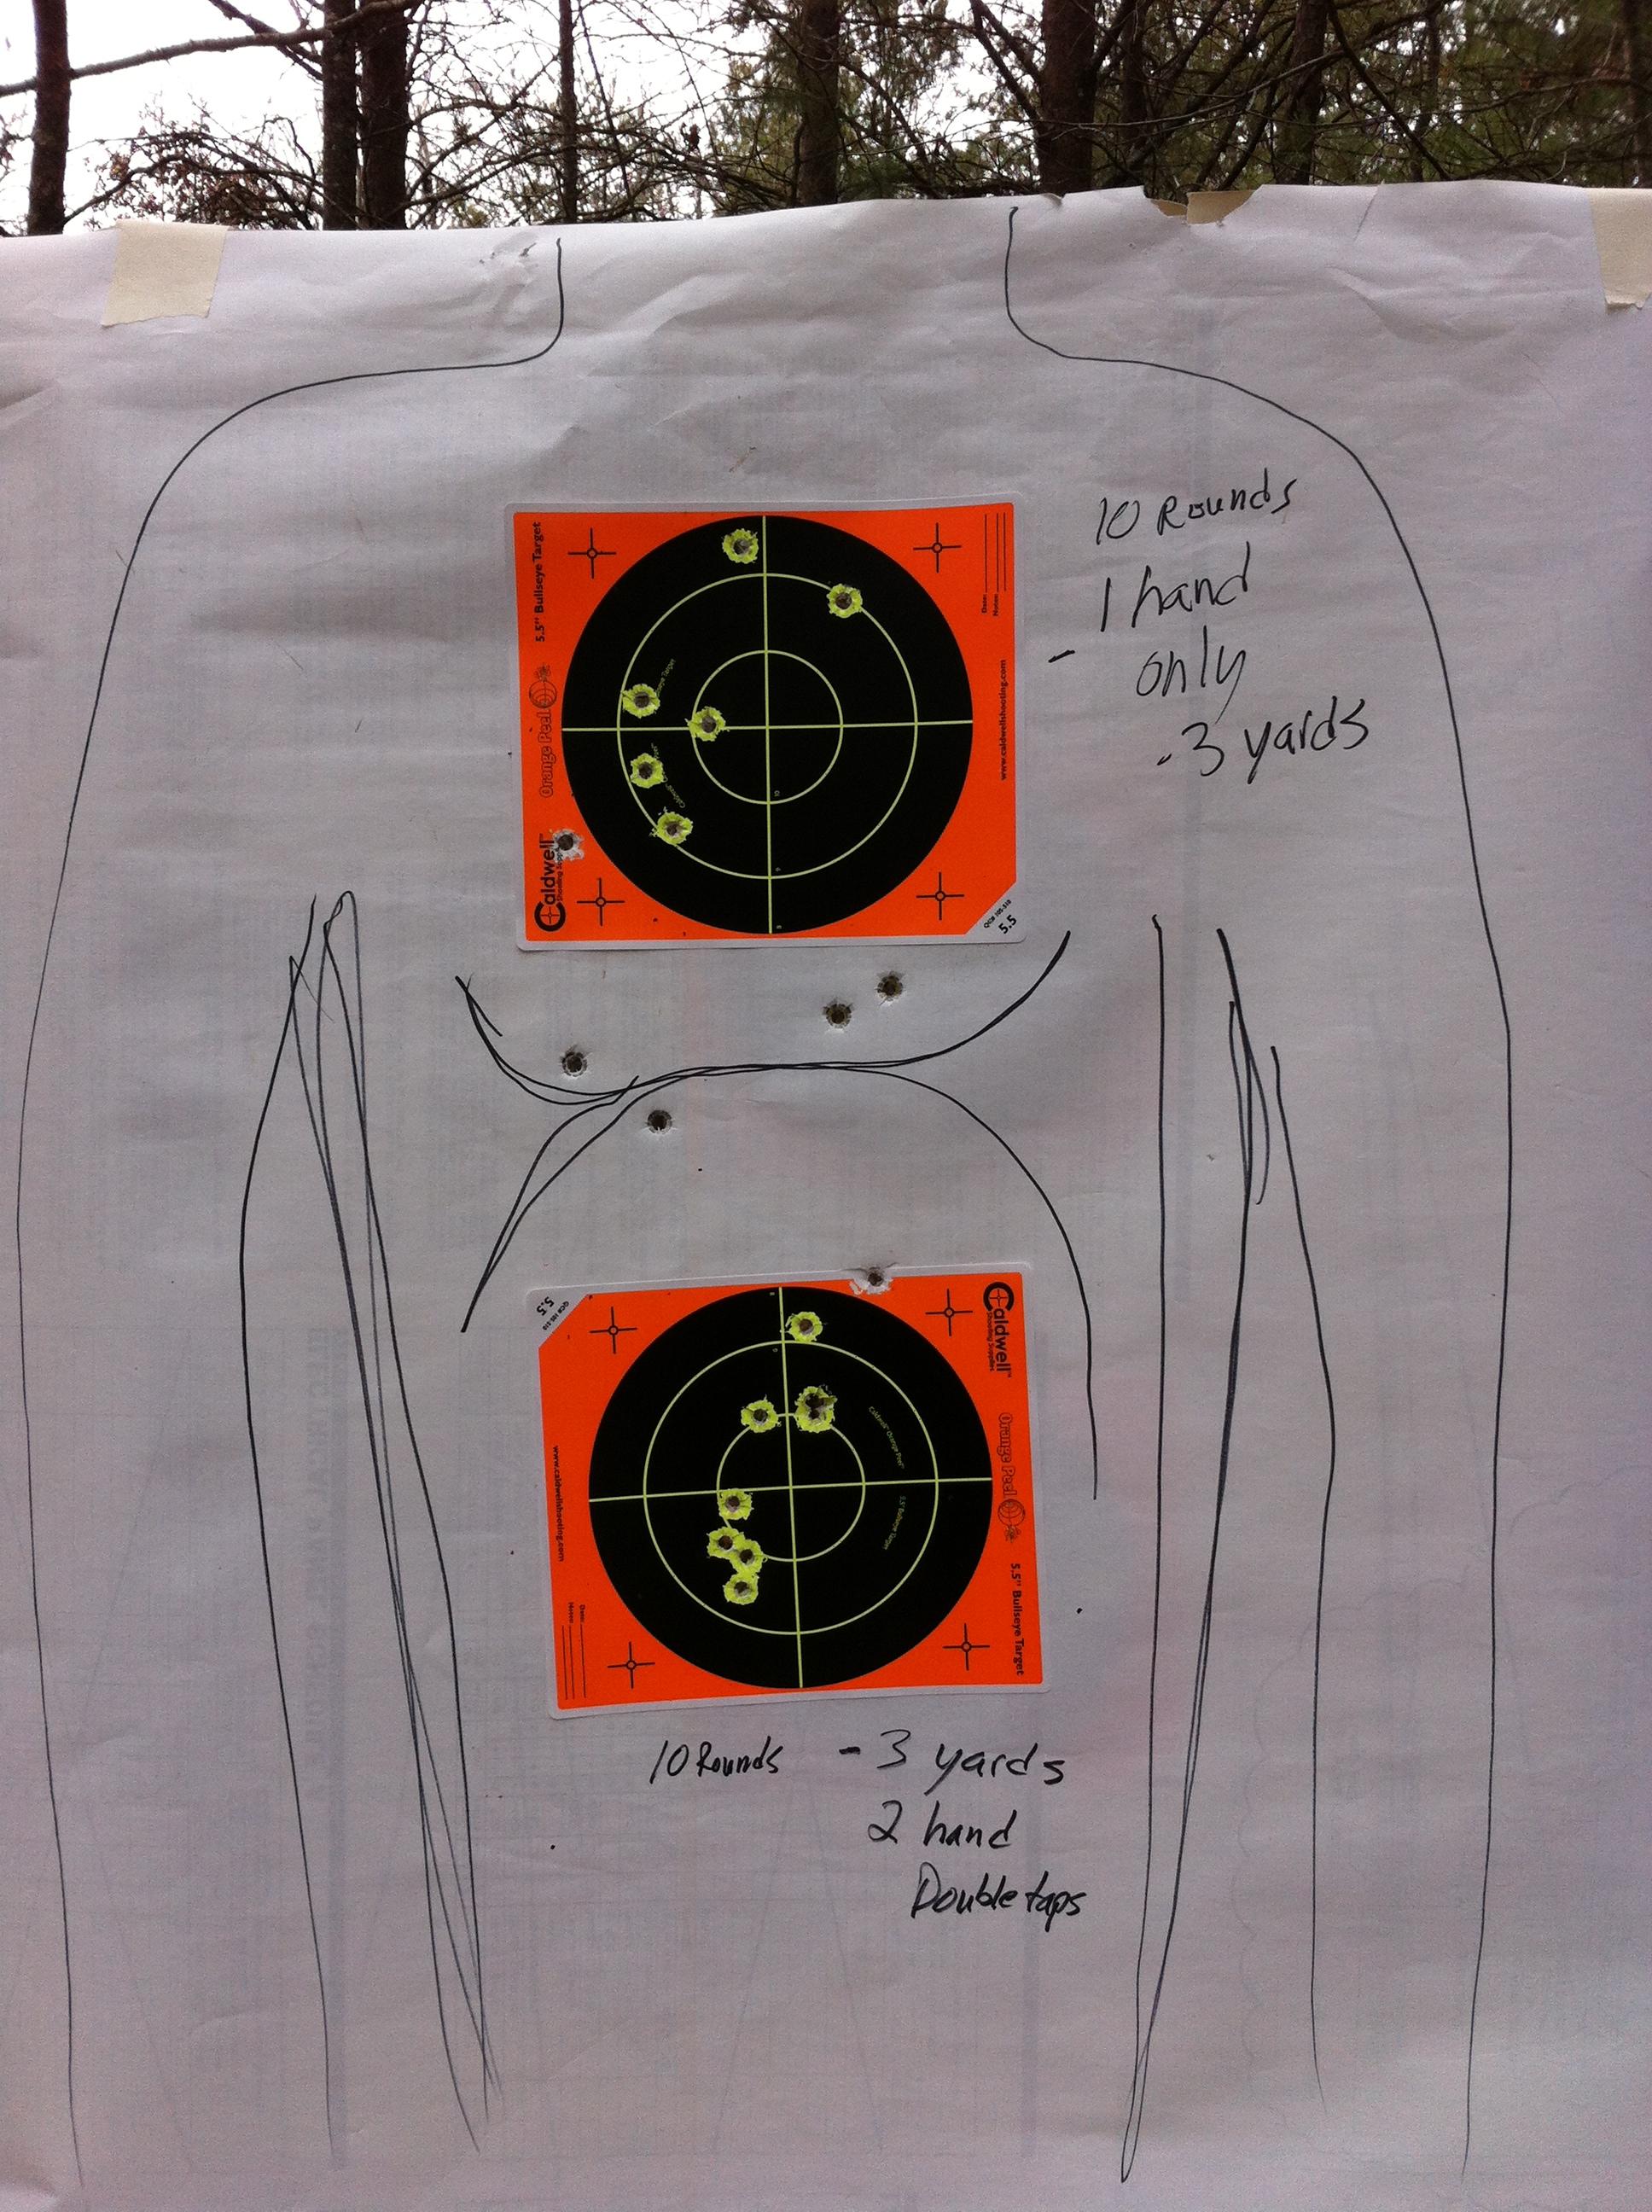 Point shooting w/live fire range trip (pics)-012.jpg